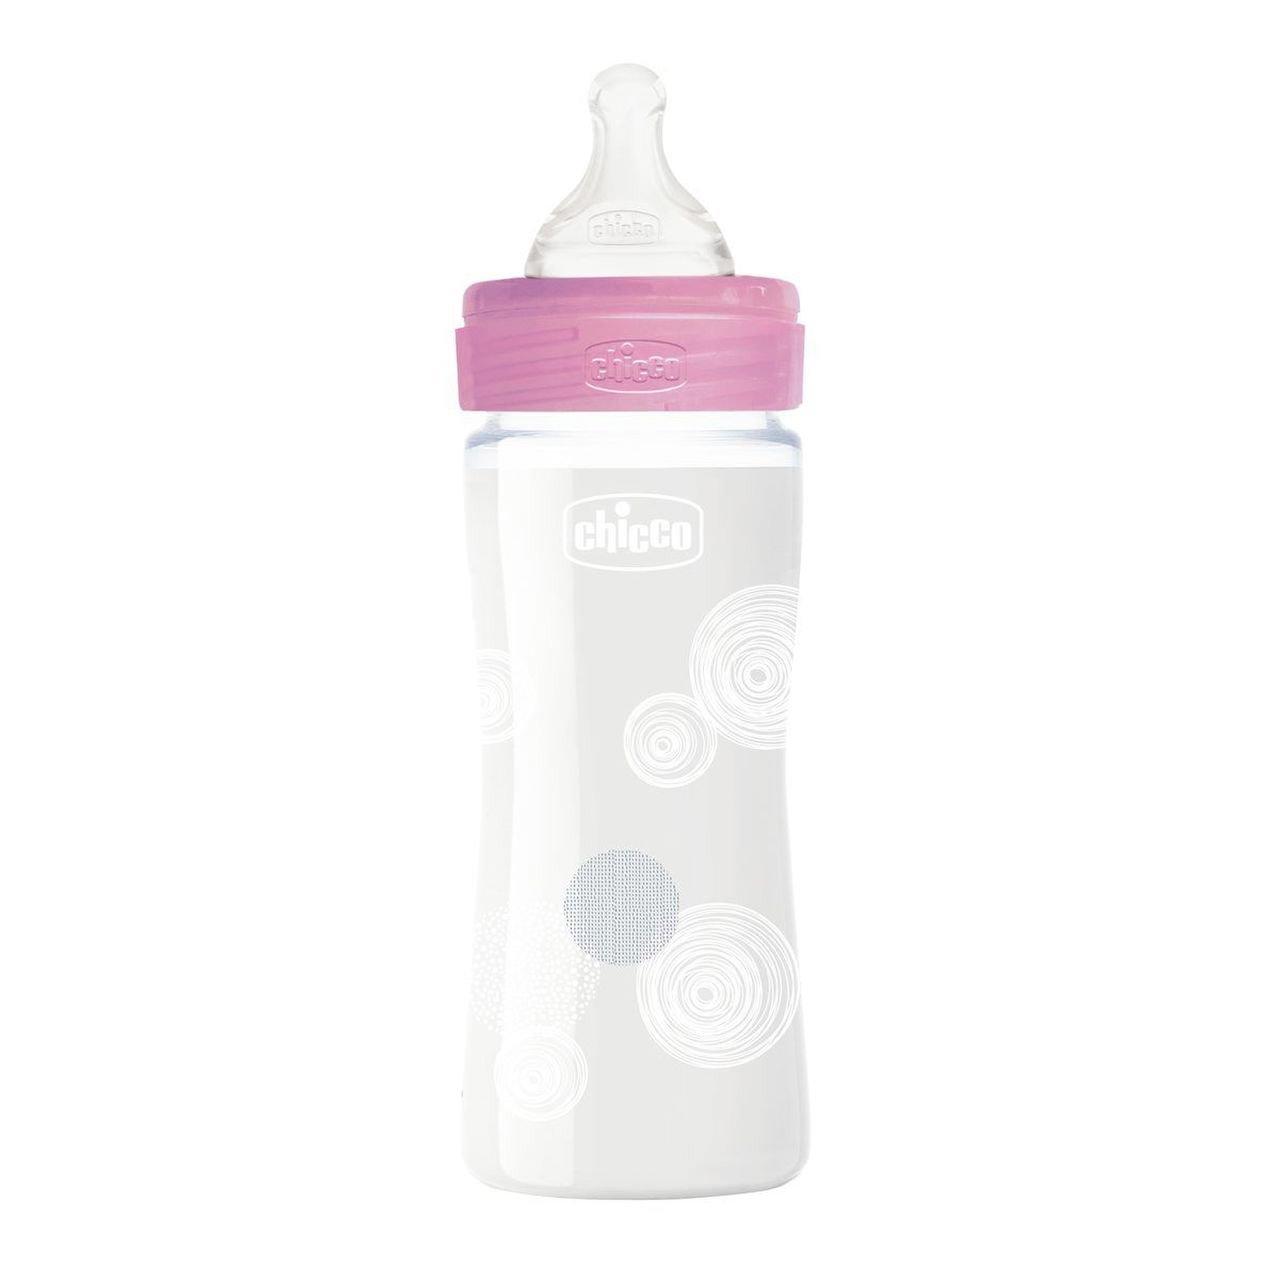 Chicco Well Being Anti Colic System Γυάλινο Μπιμπερό Χωρίς BPA με Σύστημα Κατά των Κολικών, Θηλή Σιλικόνης 0+ Μηνών 240ml – ροζ